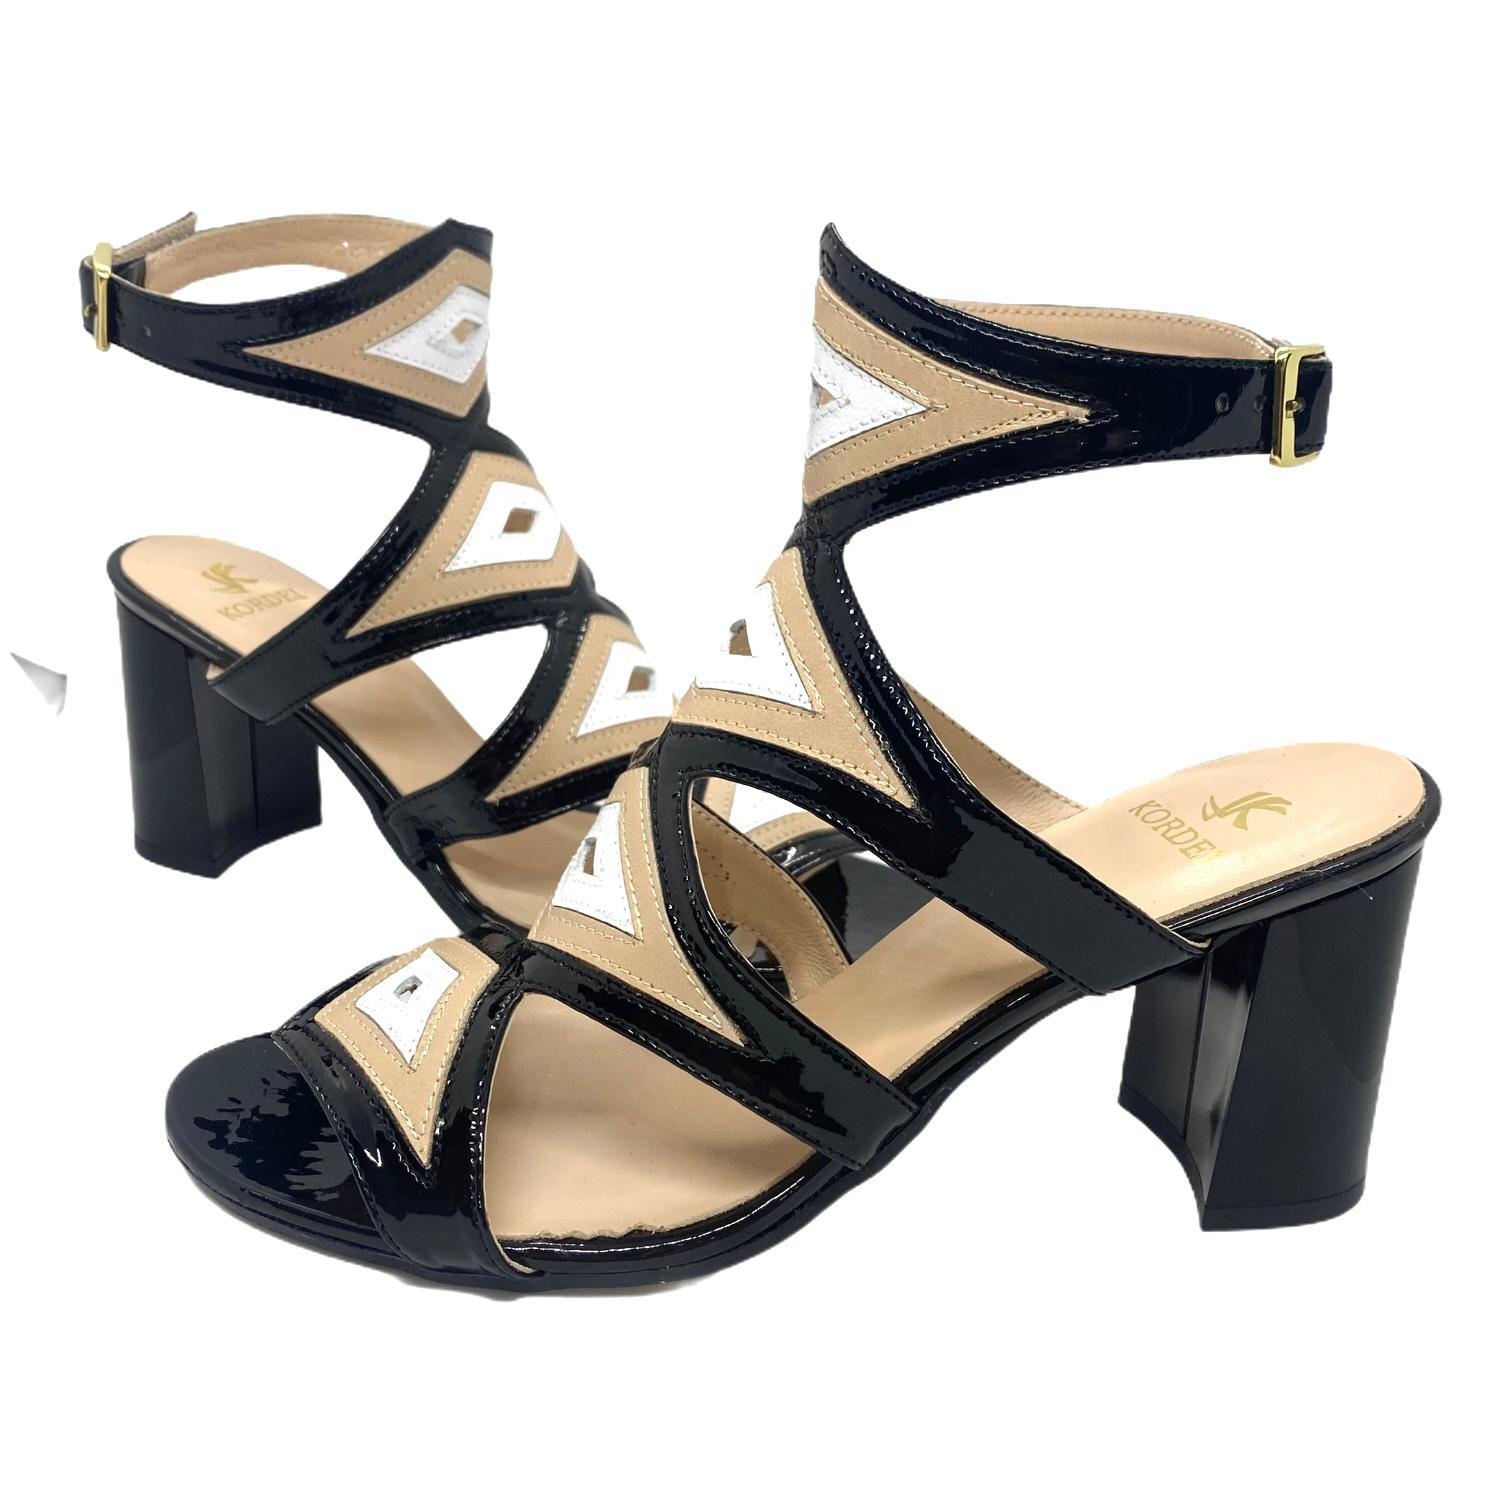 Sandale Kordel negre combinate cu bej si alb